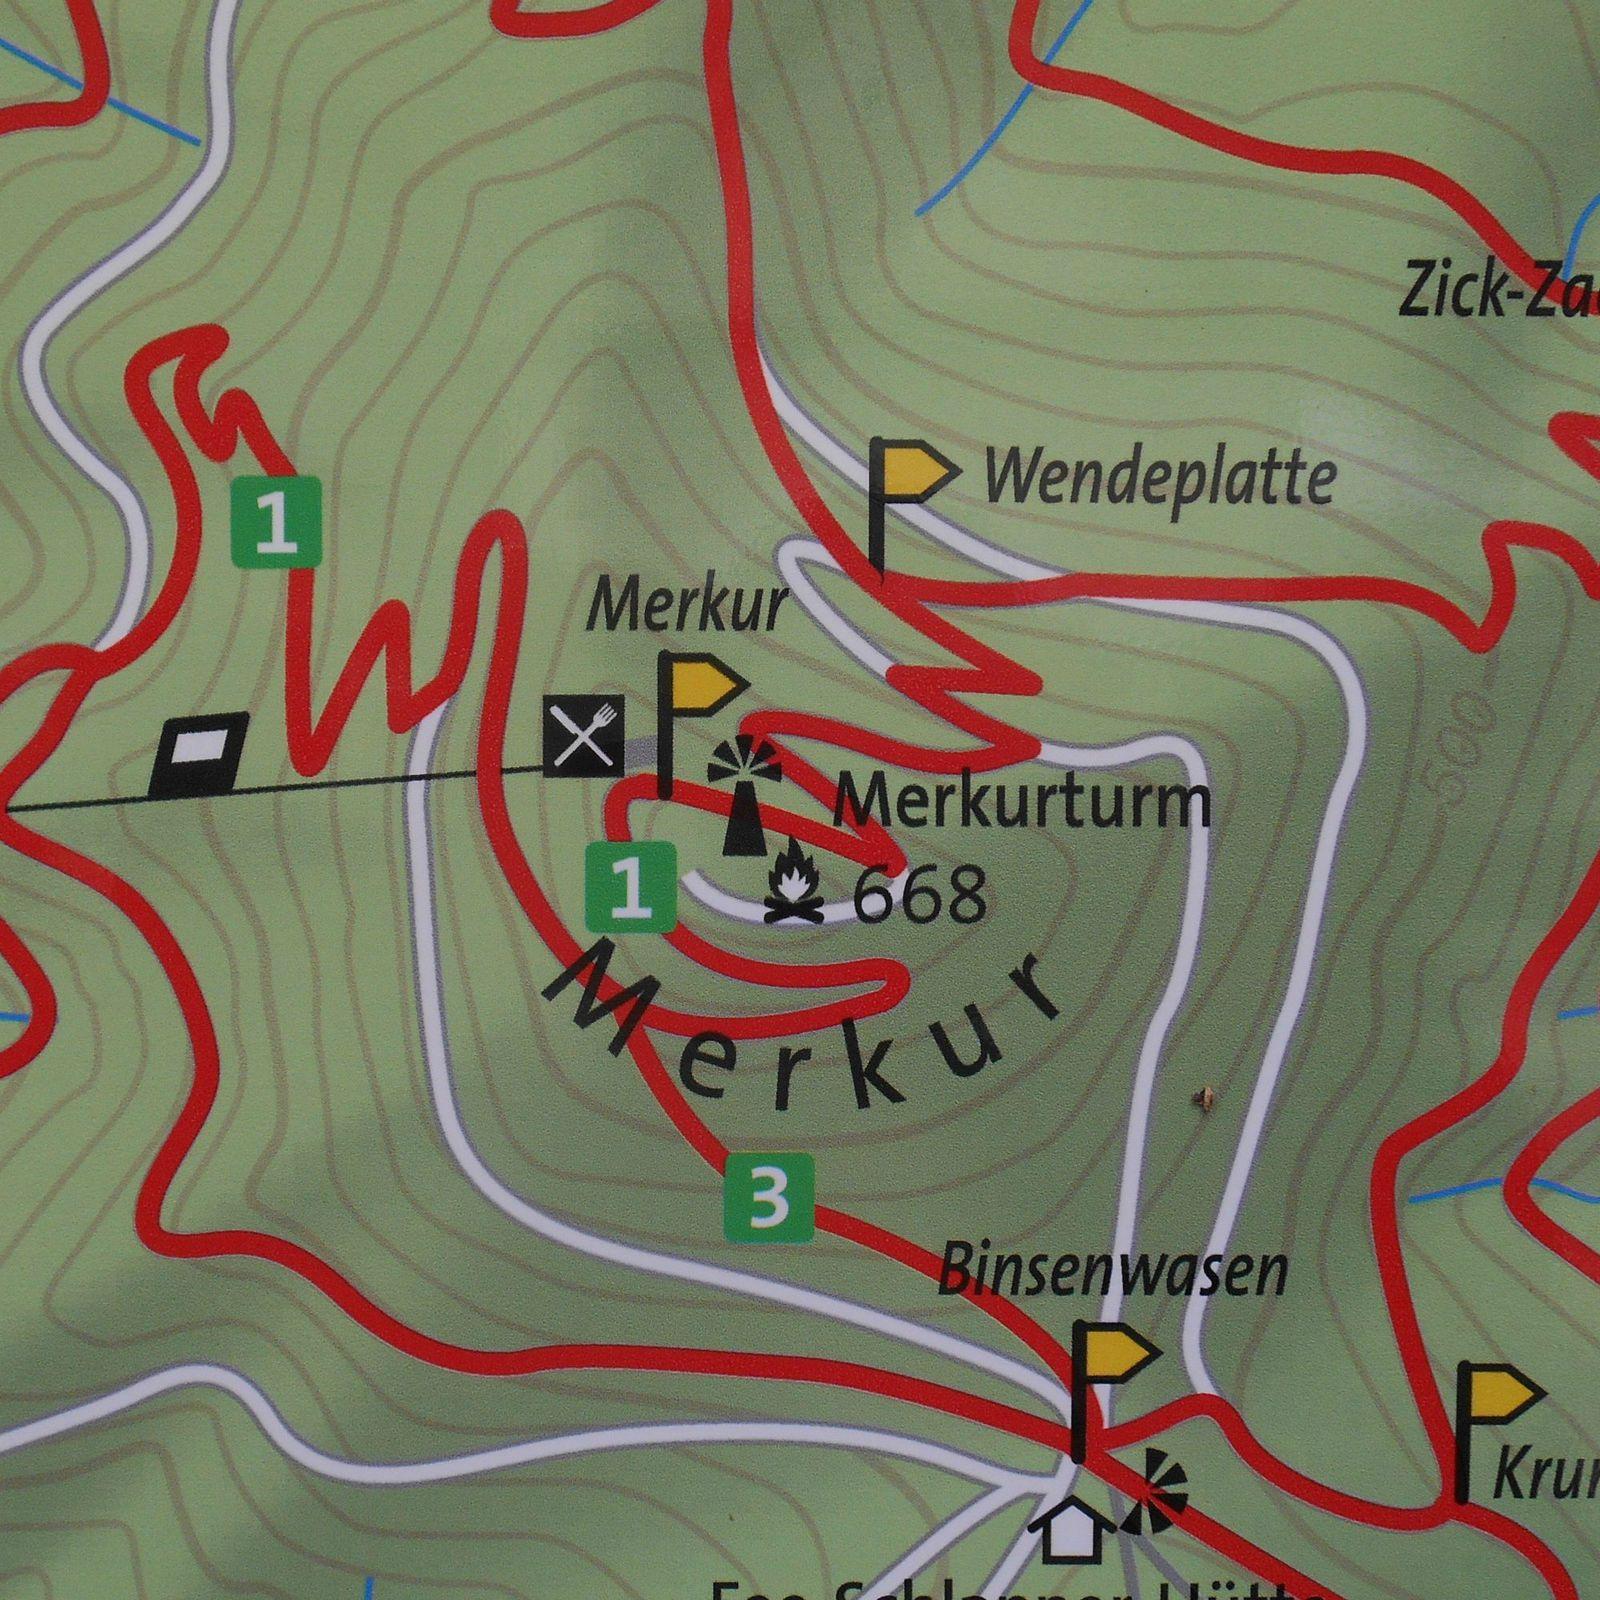 le Merkurturm, 668 m